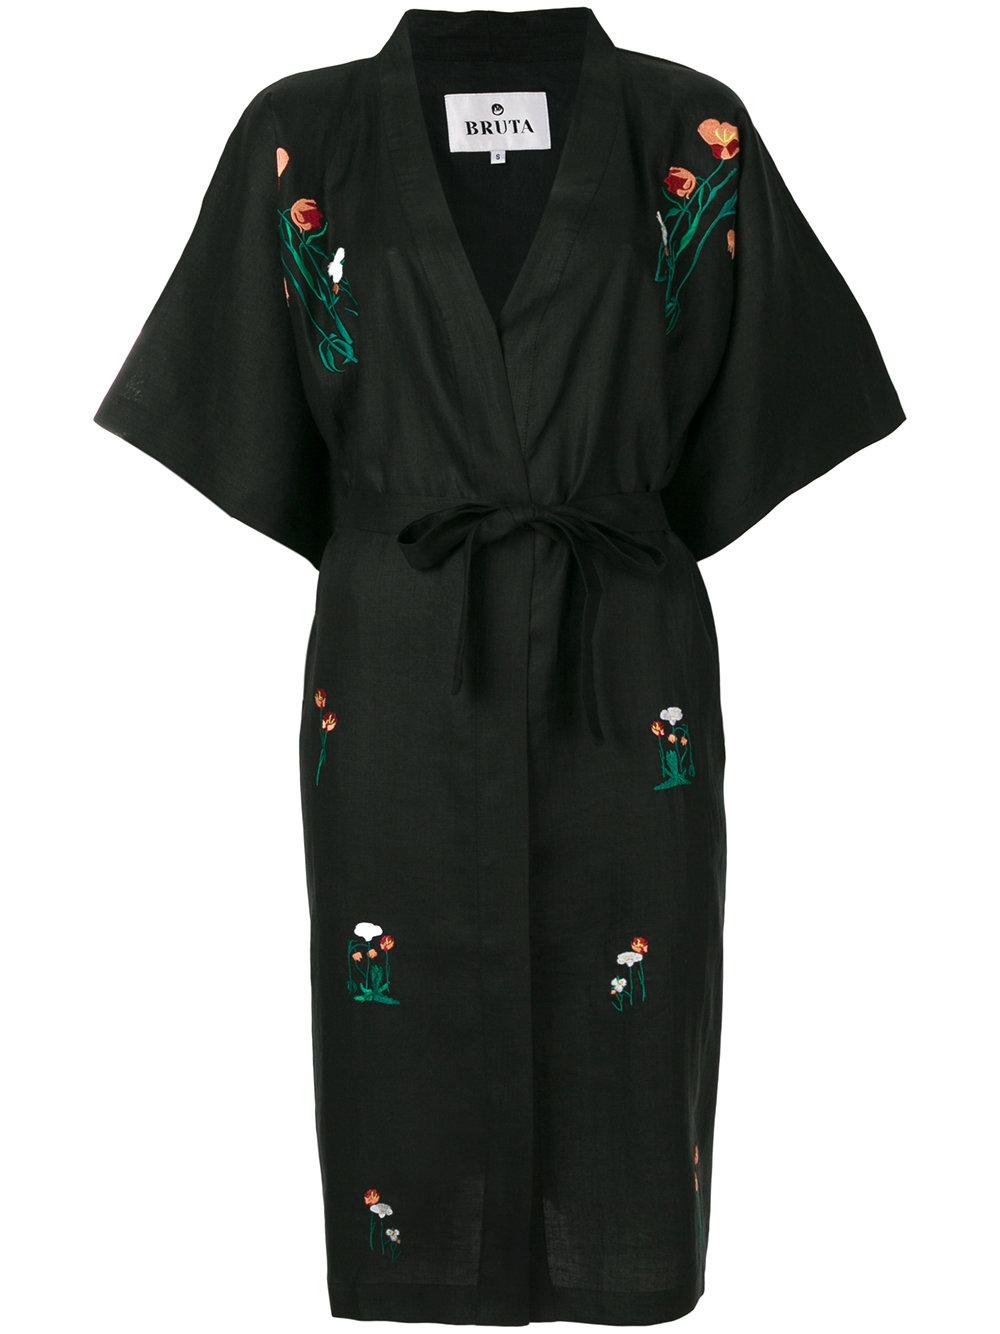 BRUTA - Bouquet kimono$330